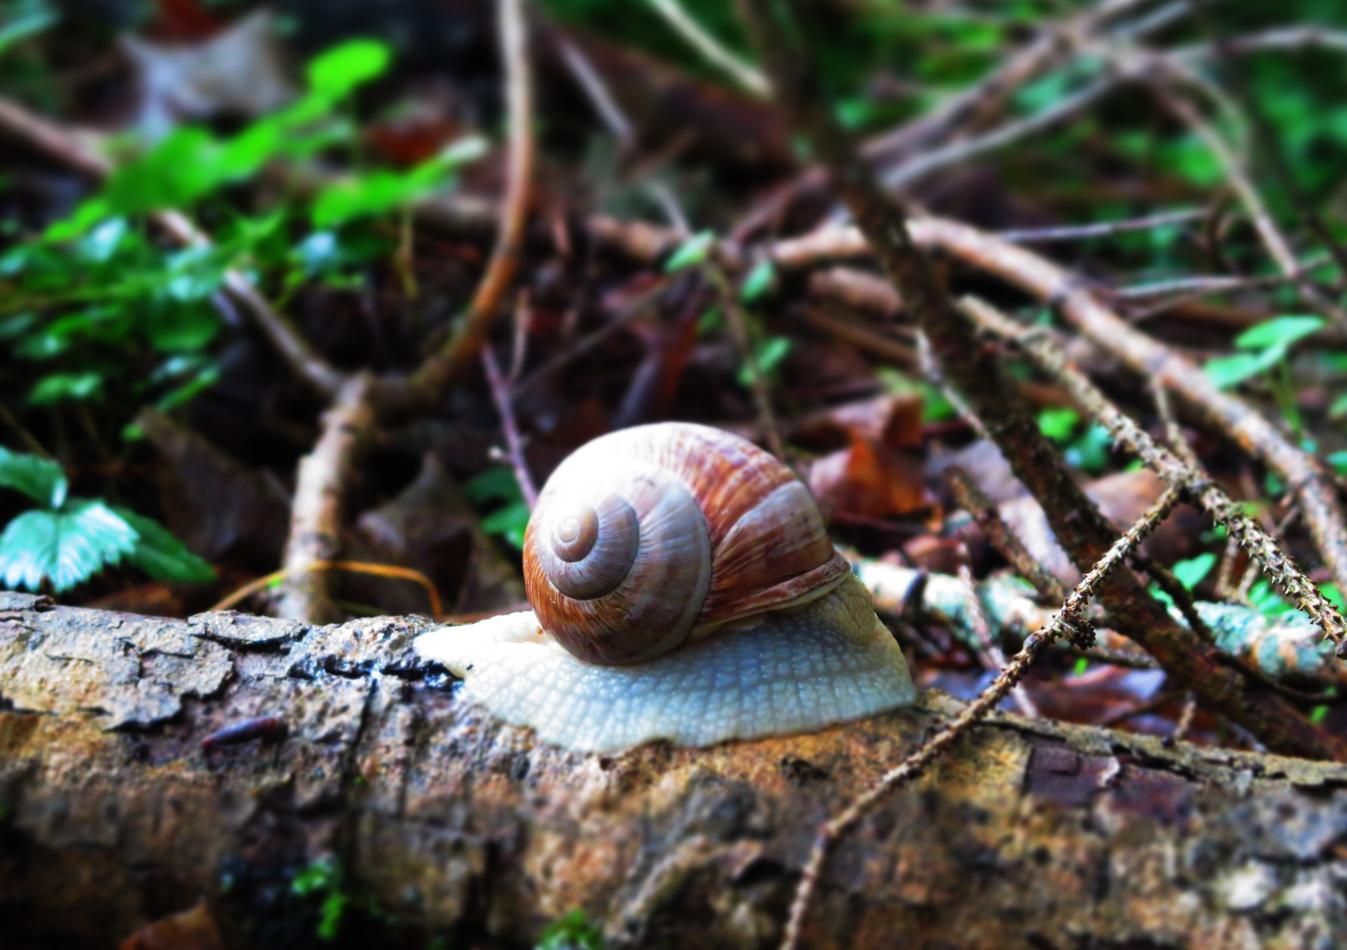 Hiking down to Telfs: snail